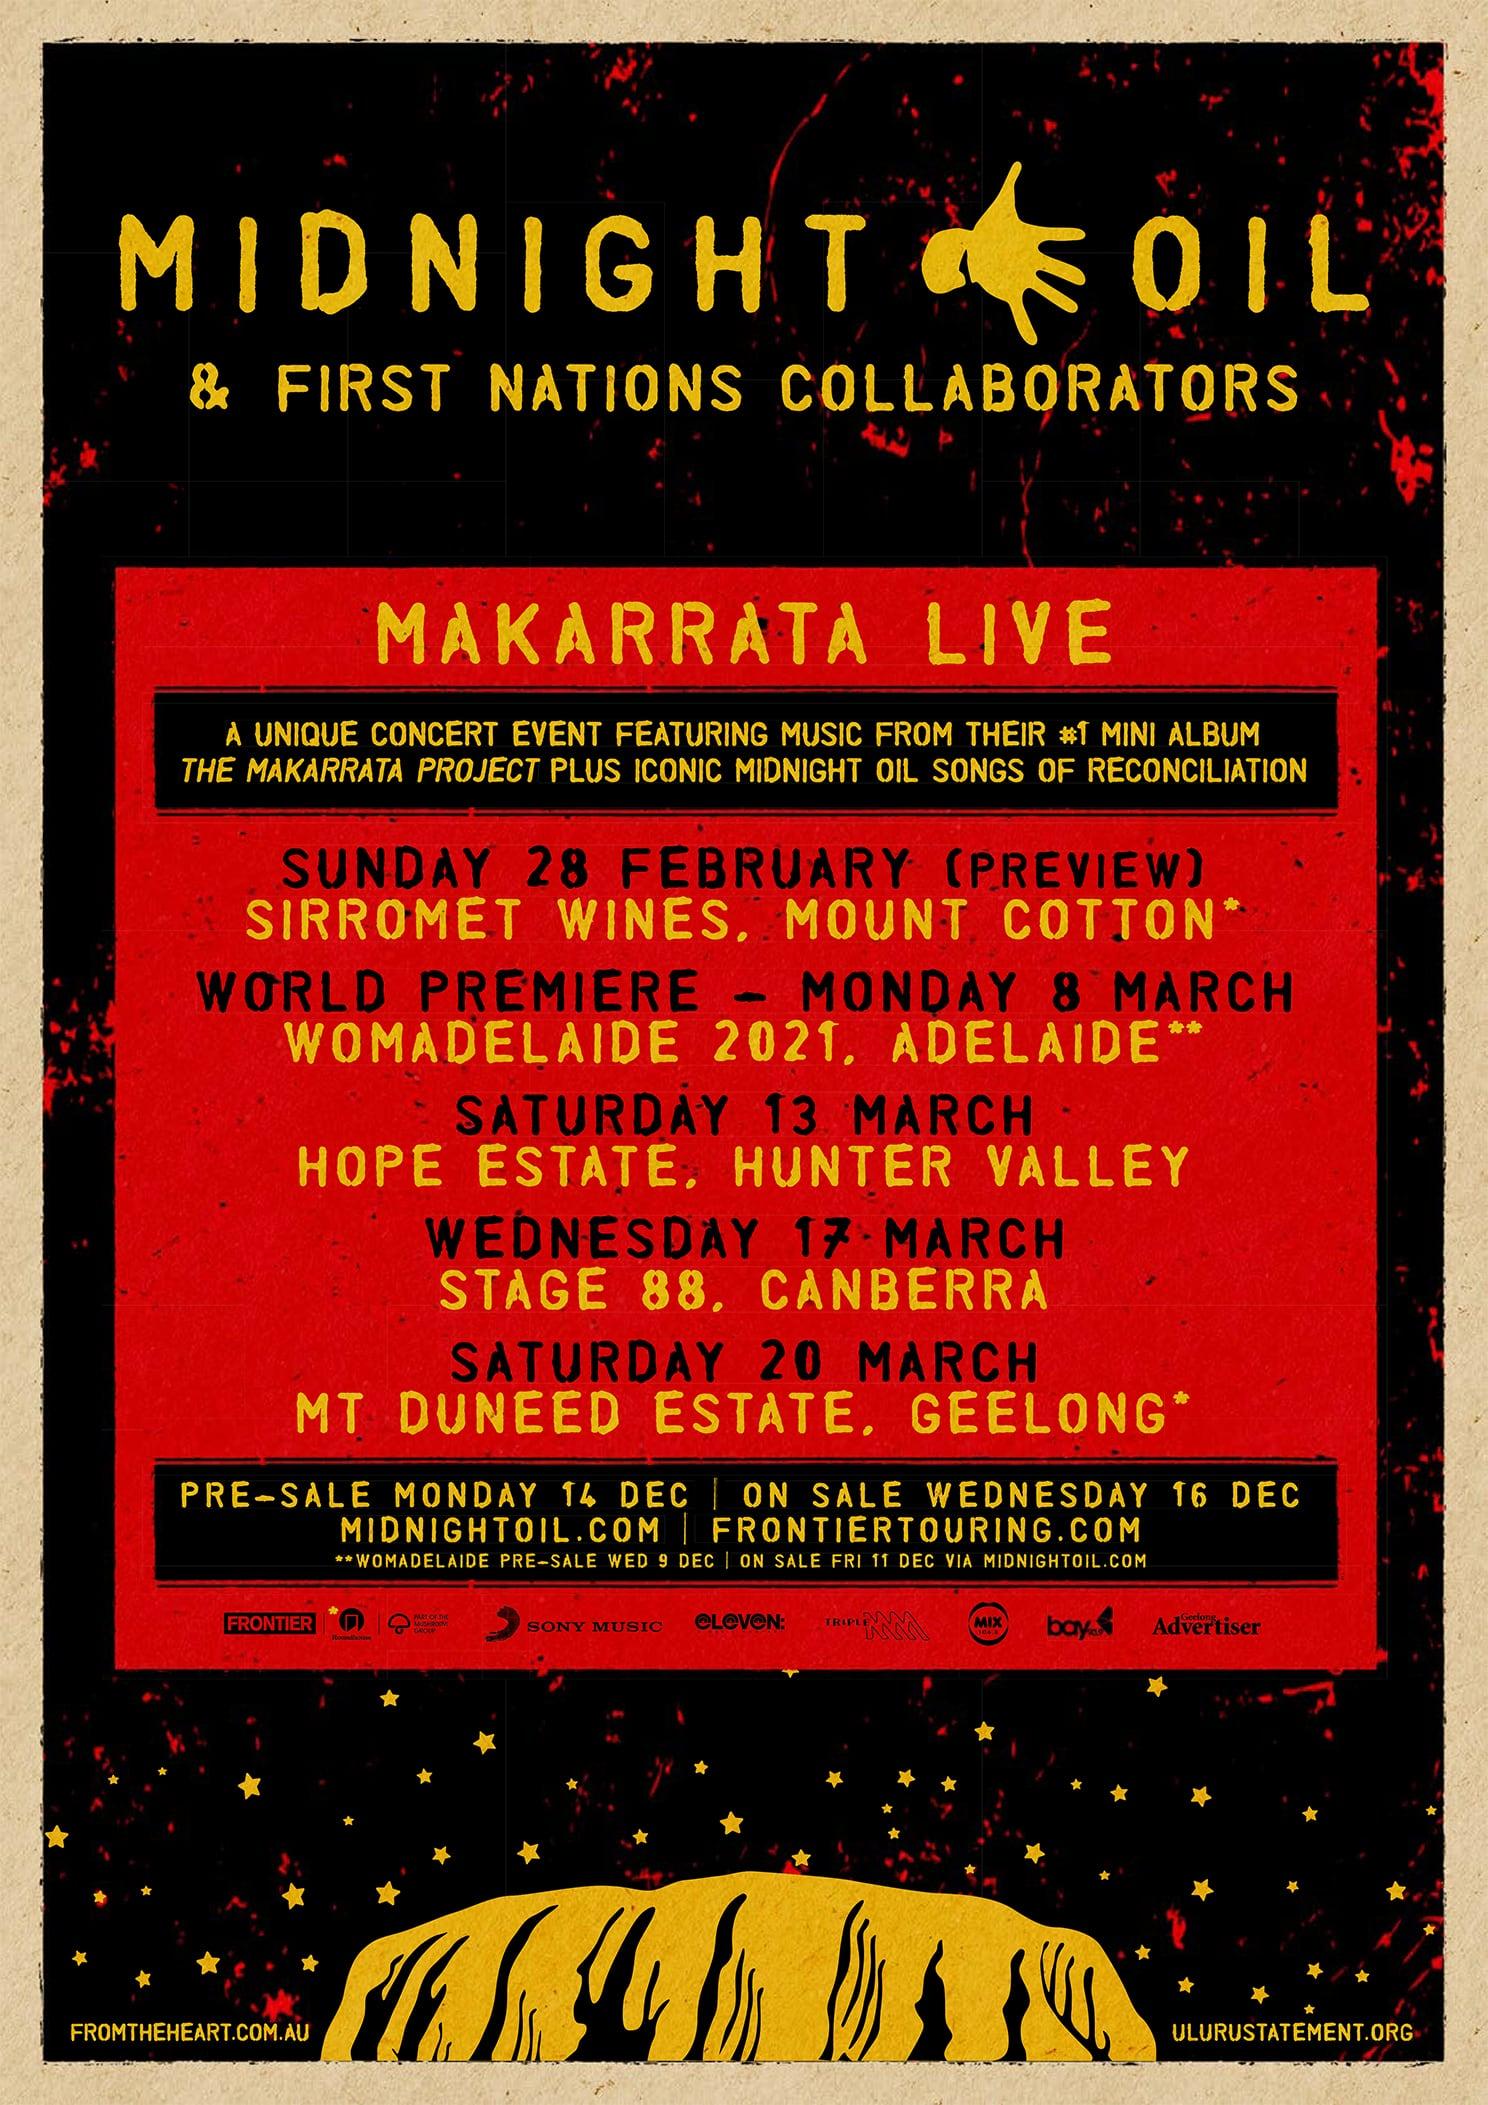 MAKARRATA LIVE tour announcement